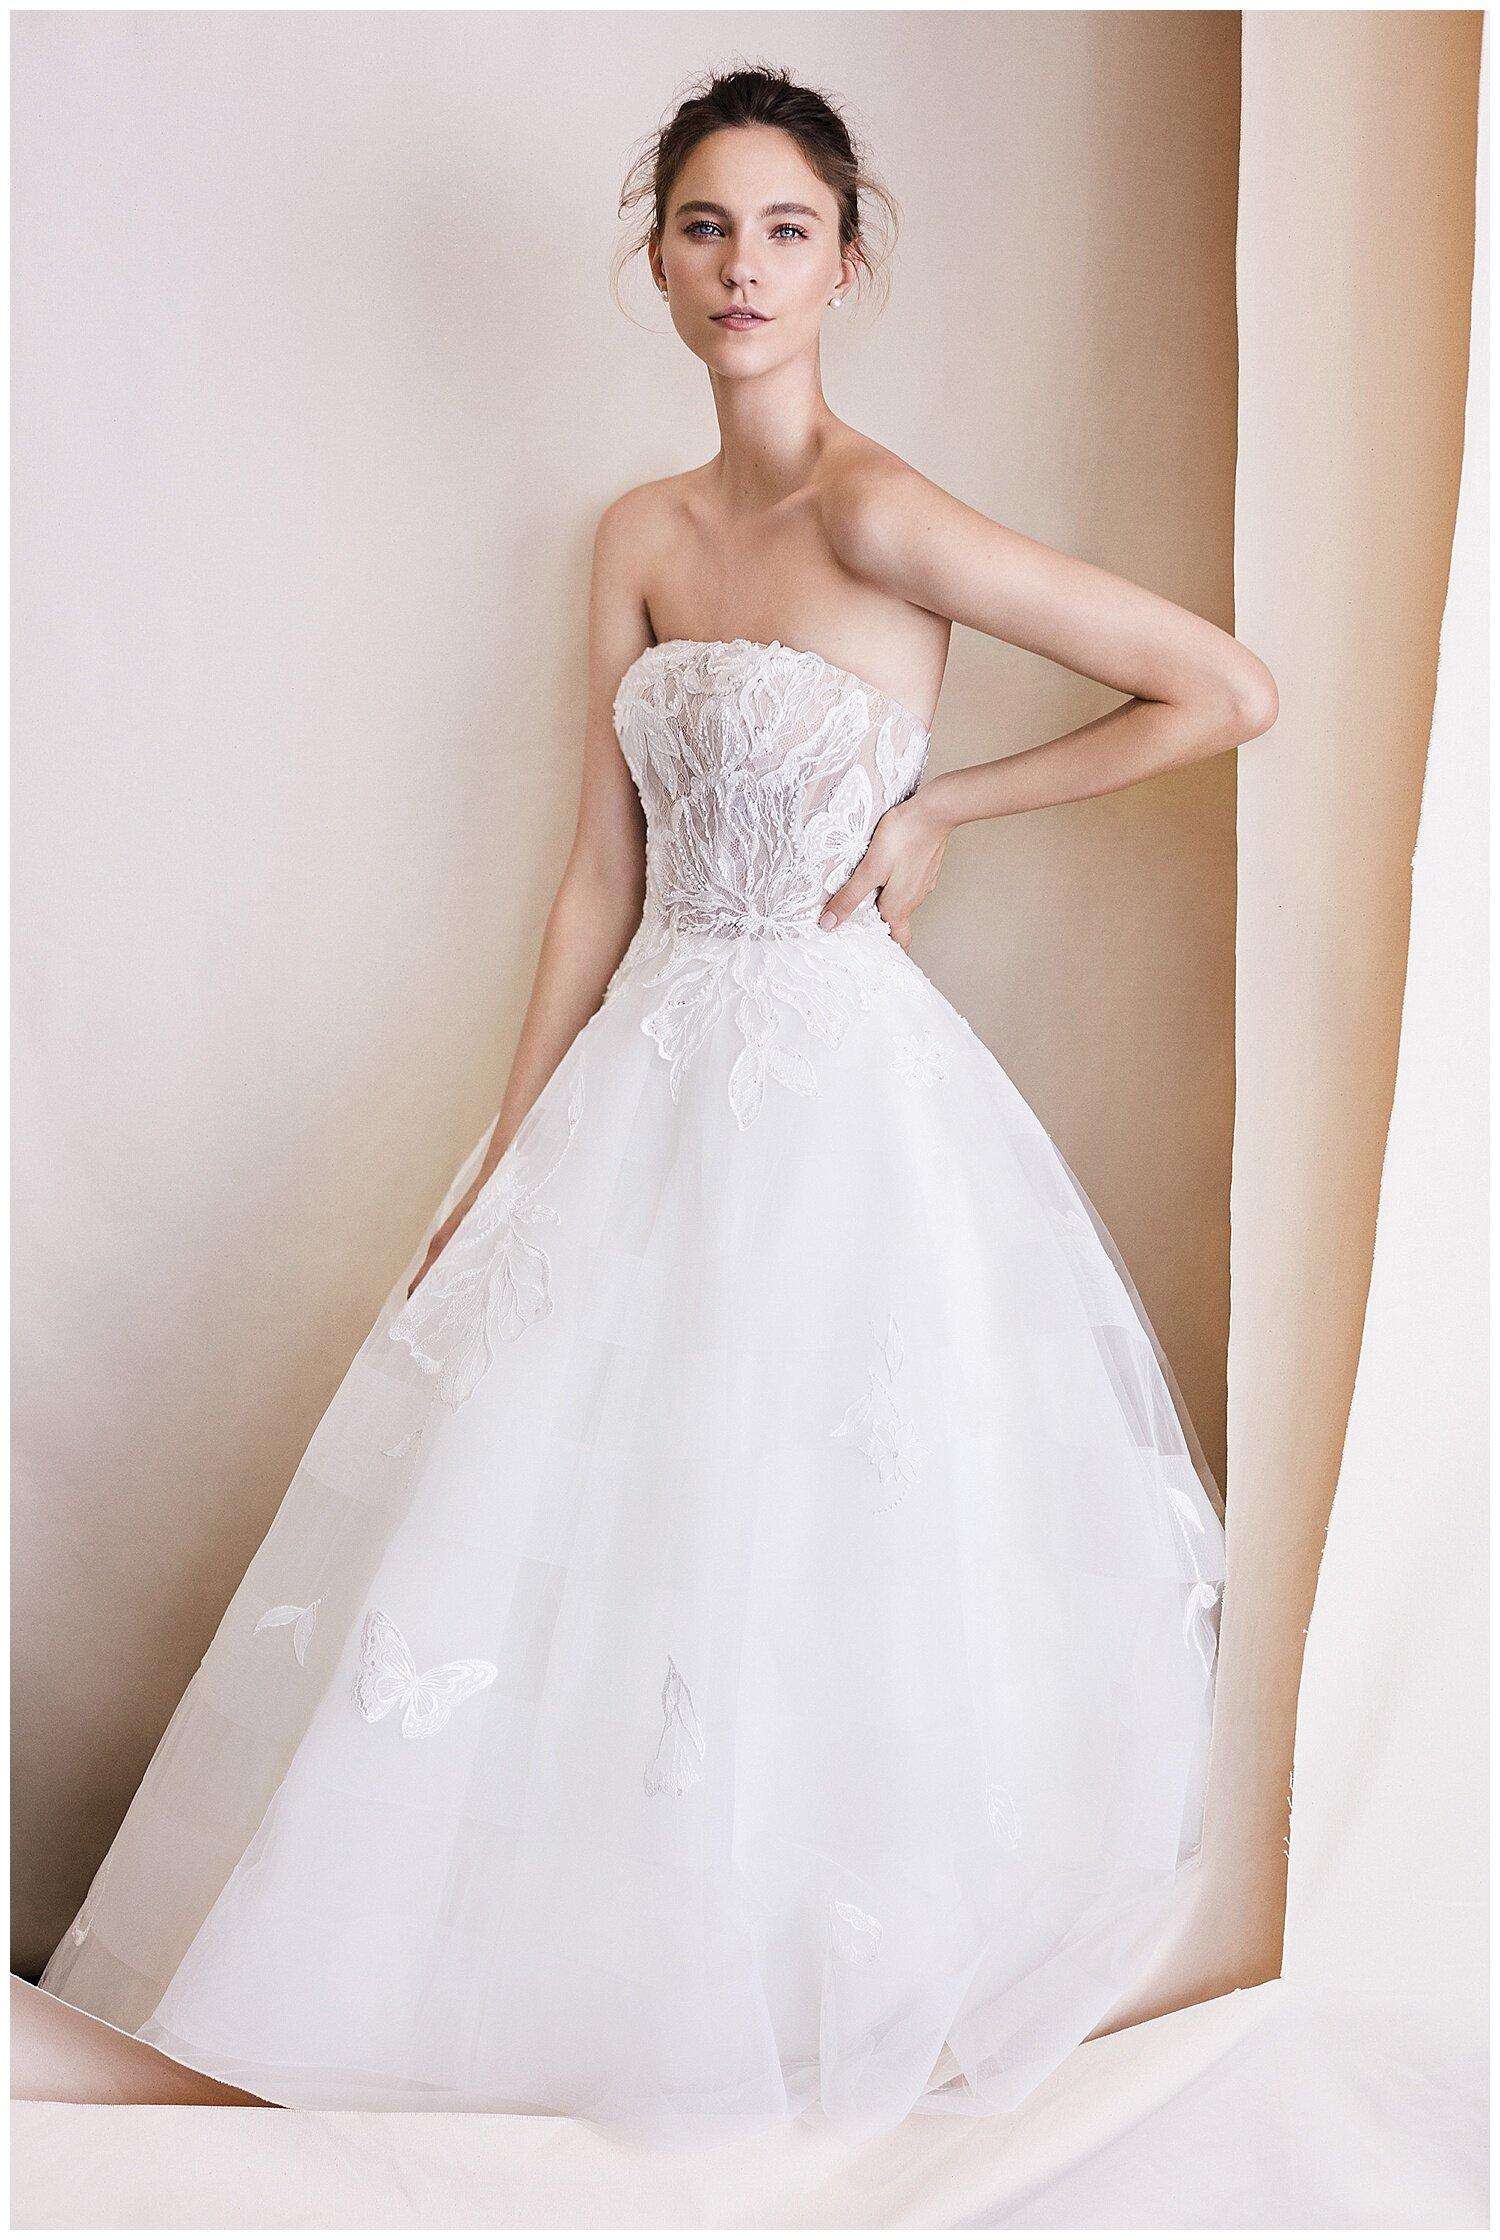 San Francisco Bay Area Wedding Dresses California Bride Boutique